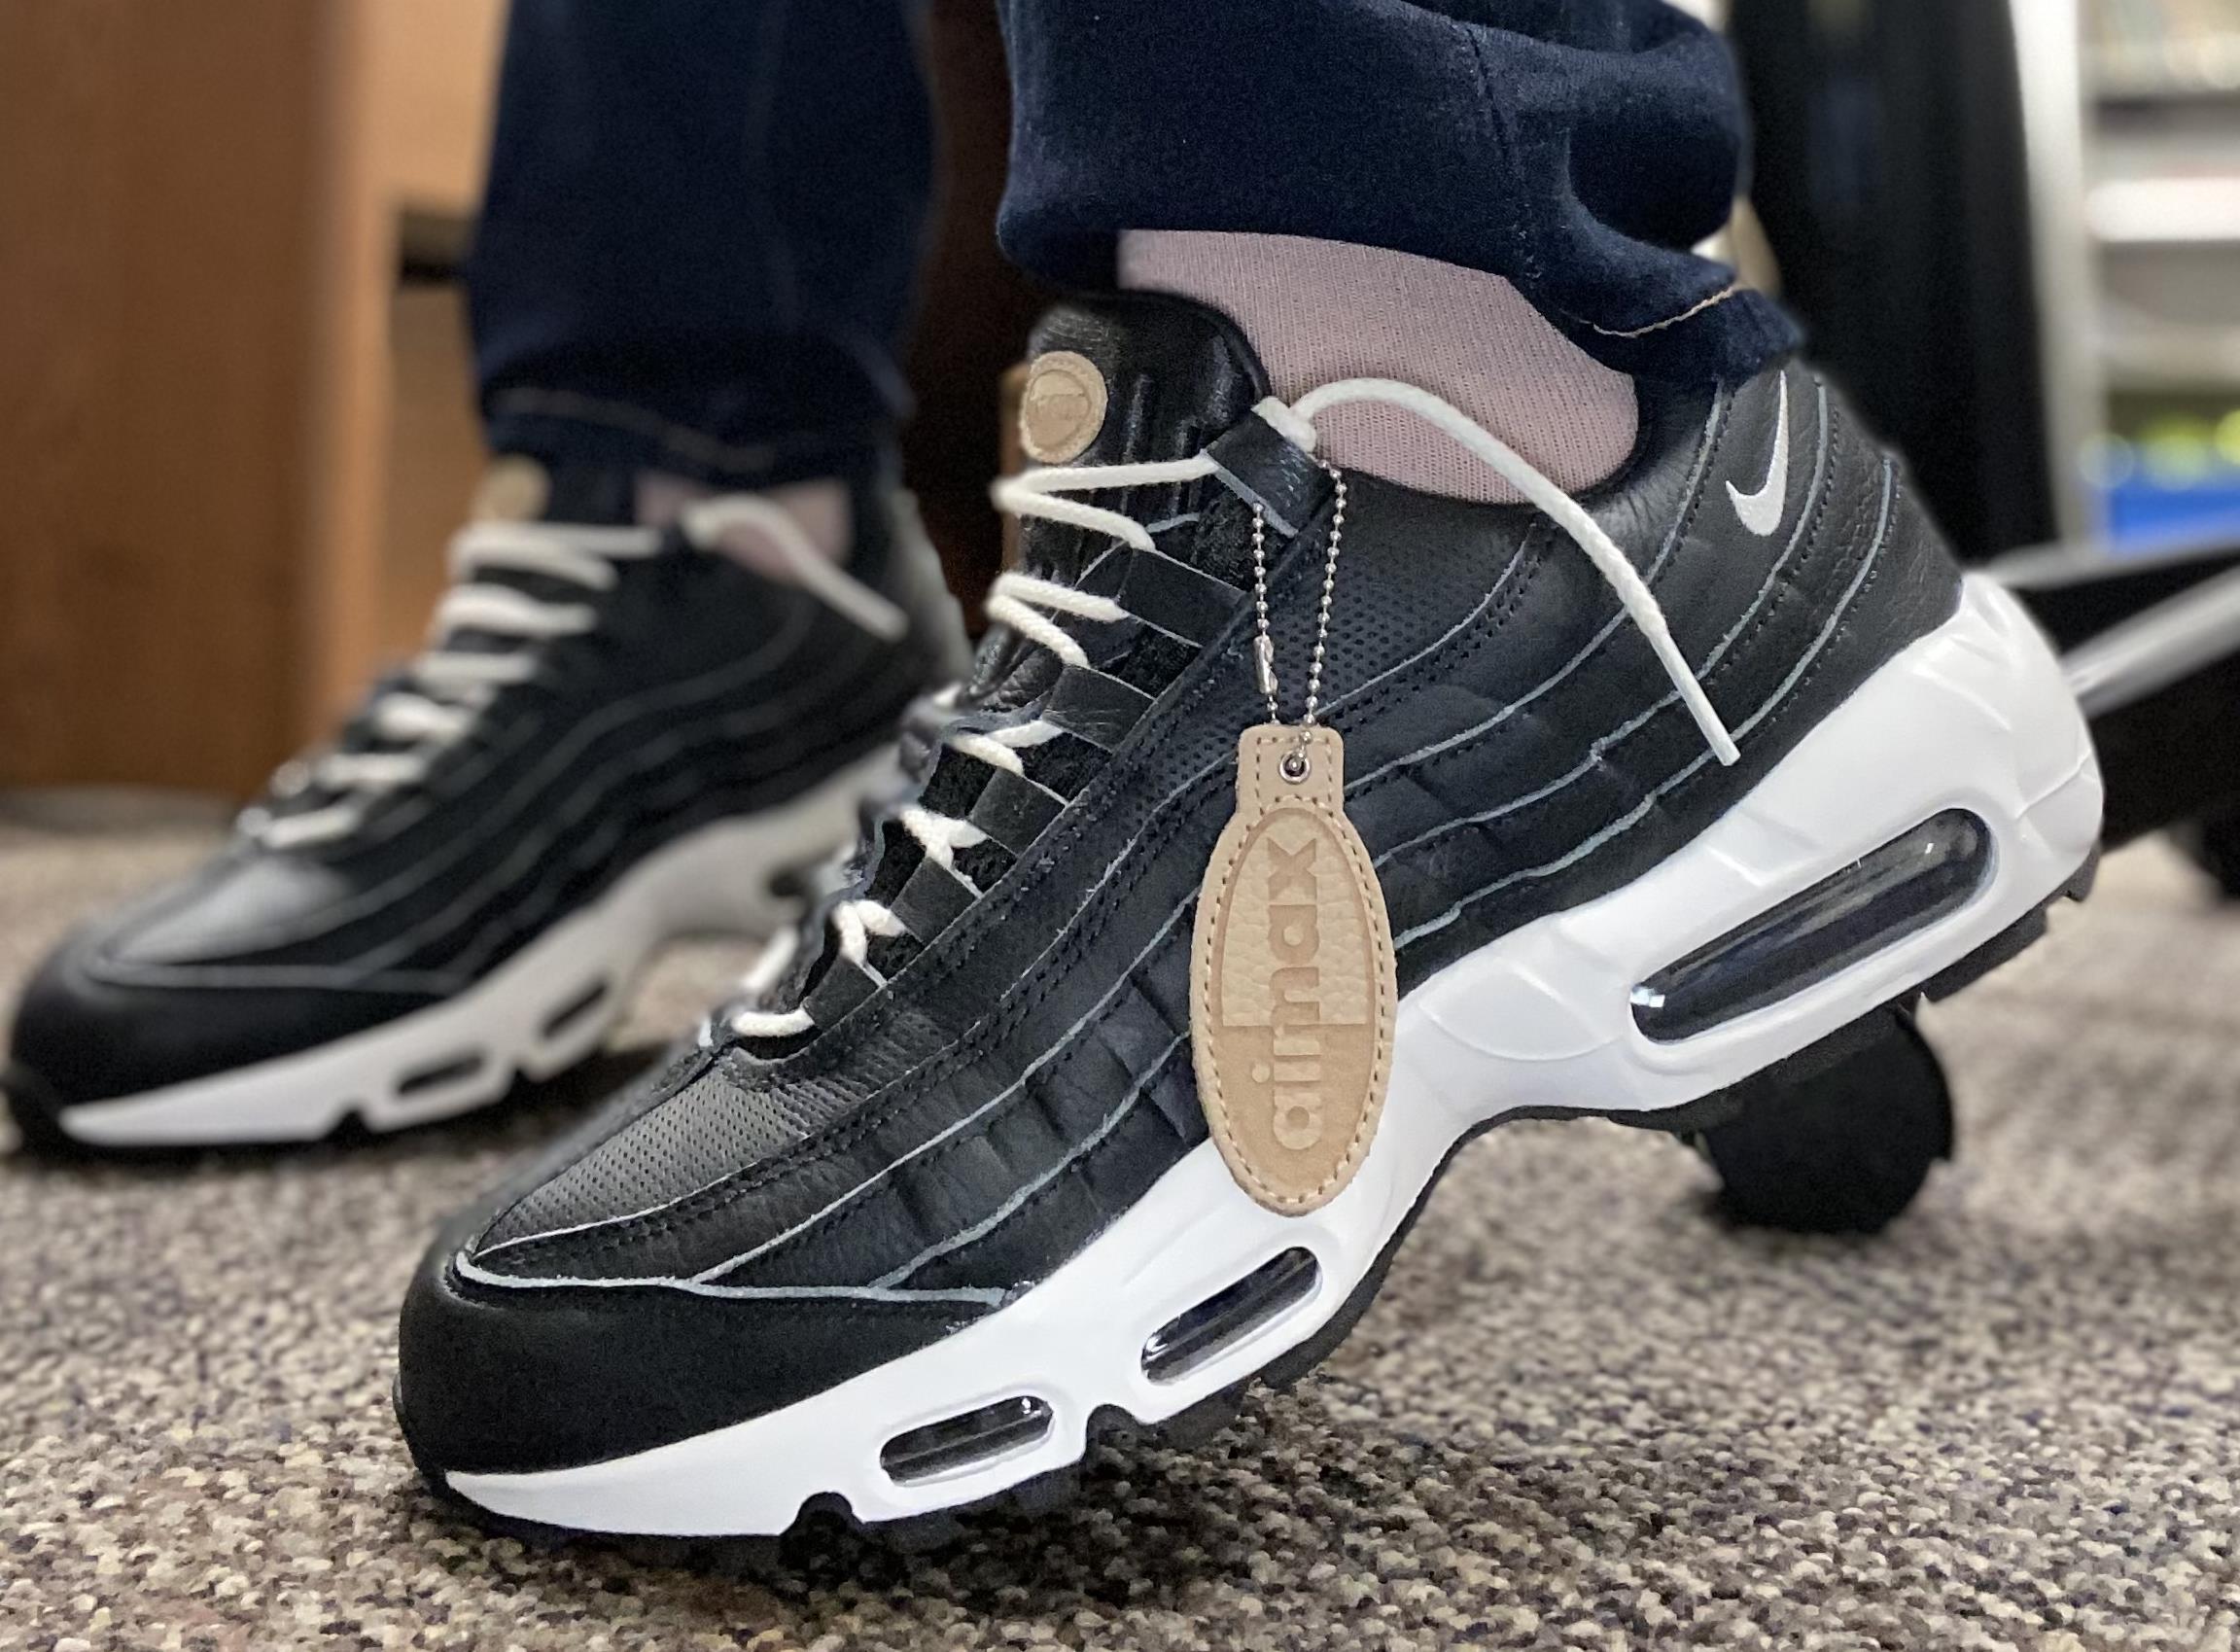 #ShoeCam #Nike #AirMax